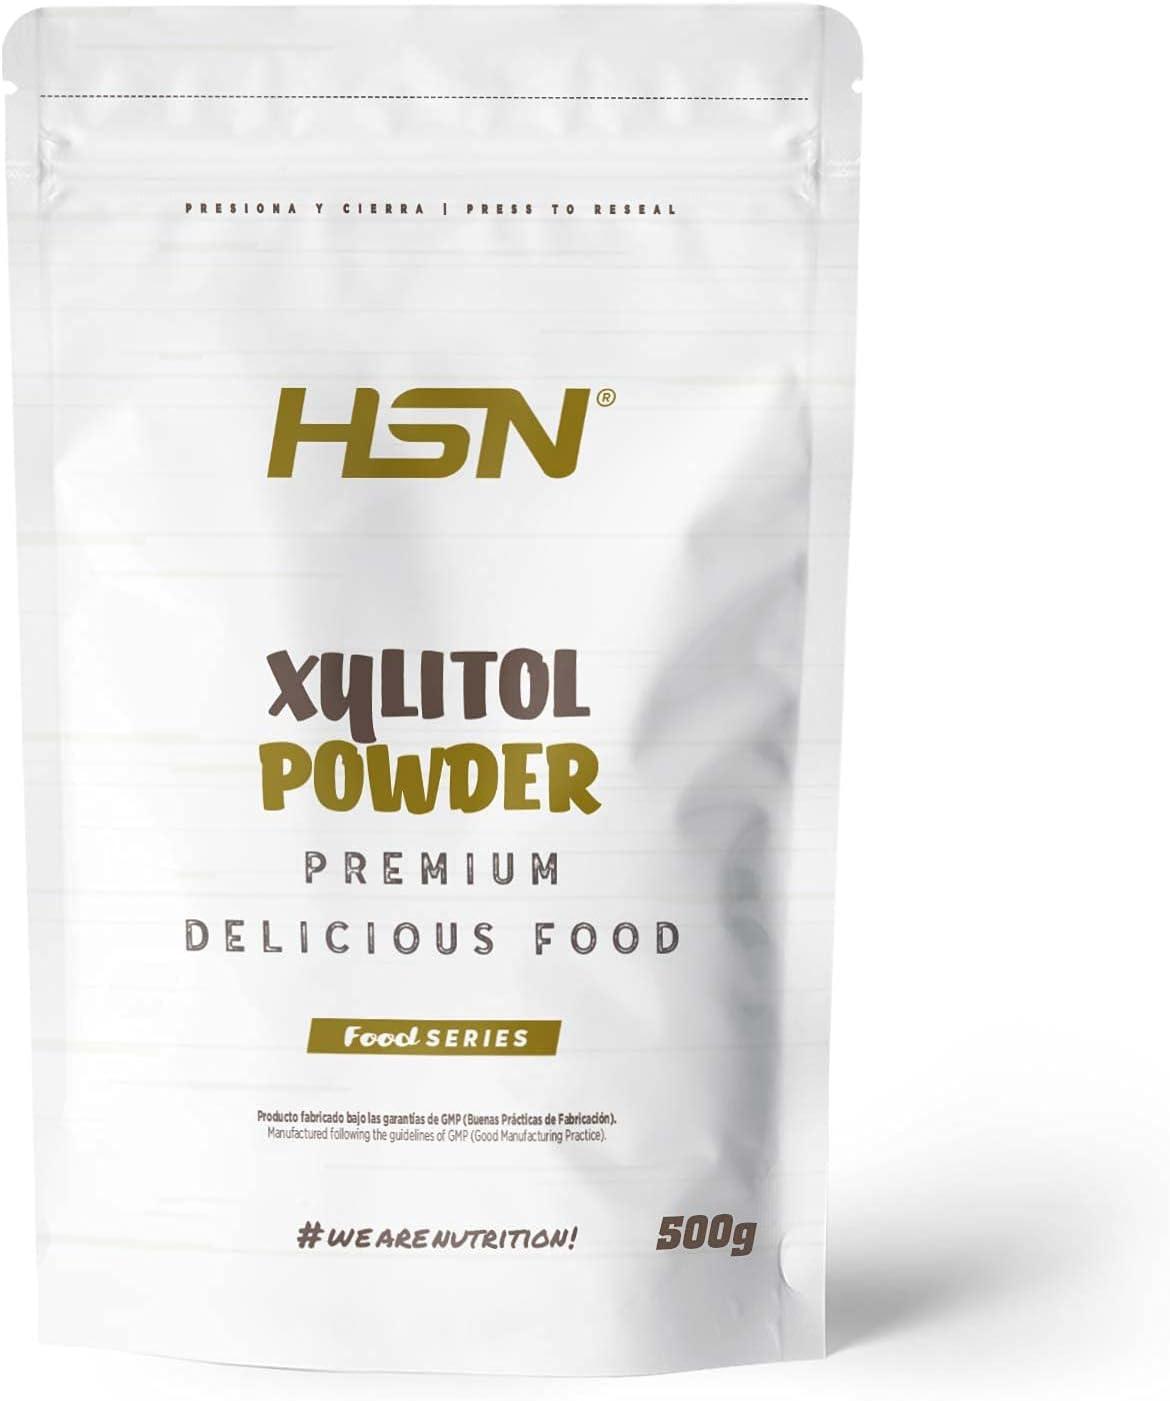 Xilitol de HSN | Sustituto del Azúcar | Edulcorante en Polvo Sin Calorías | Endulzante Sin Azúcar | Ideal para Recetas Fitness | No-GMO, Vegano, Sin Gluten, Sin Lactosa | 500 gr